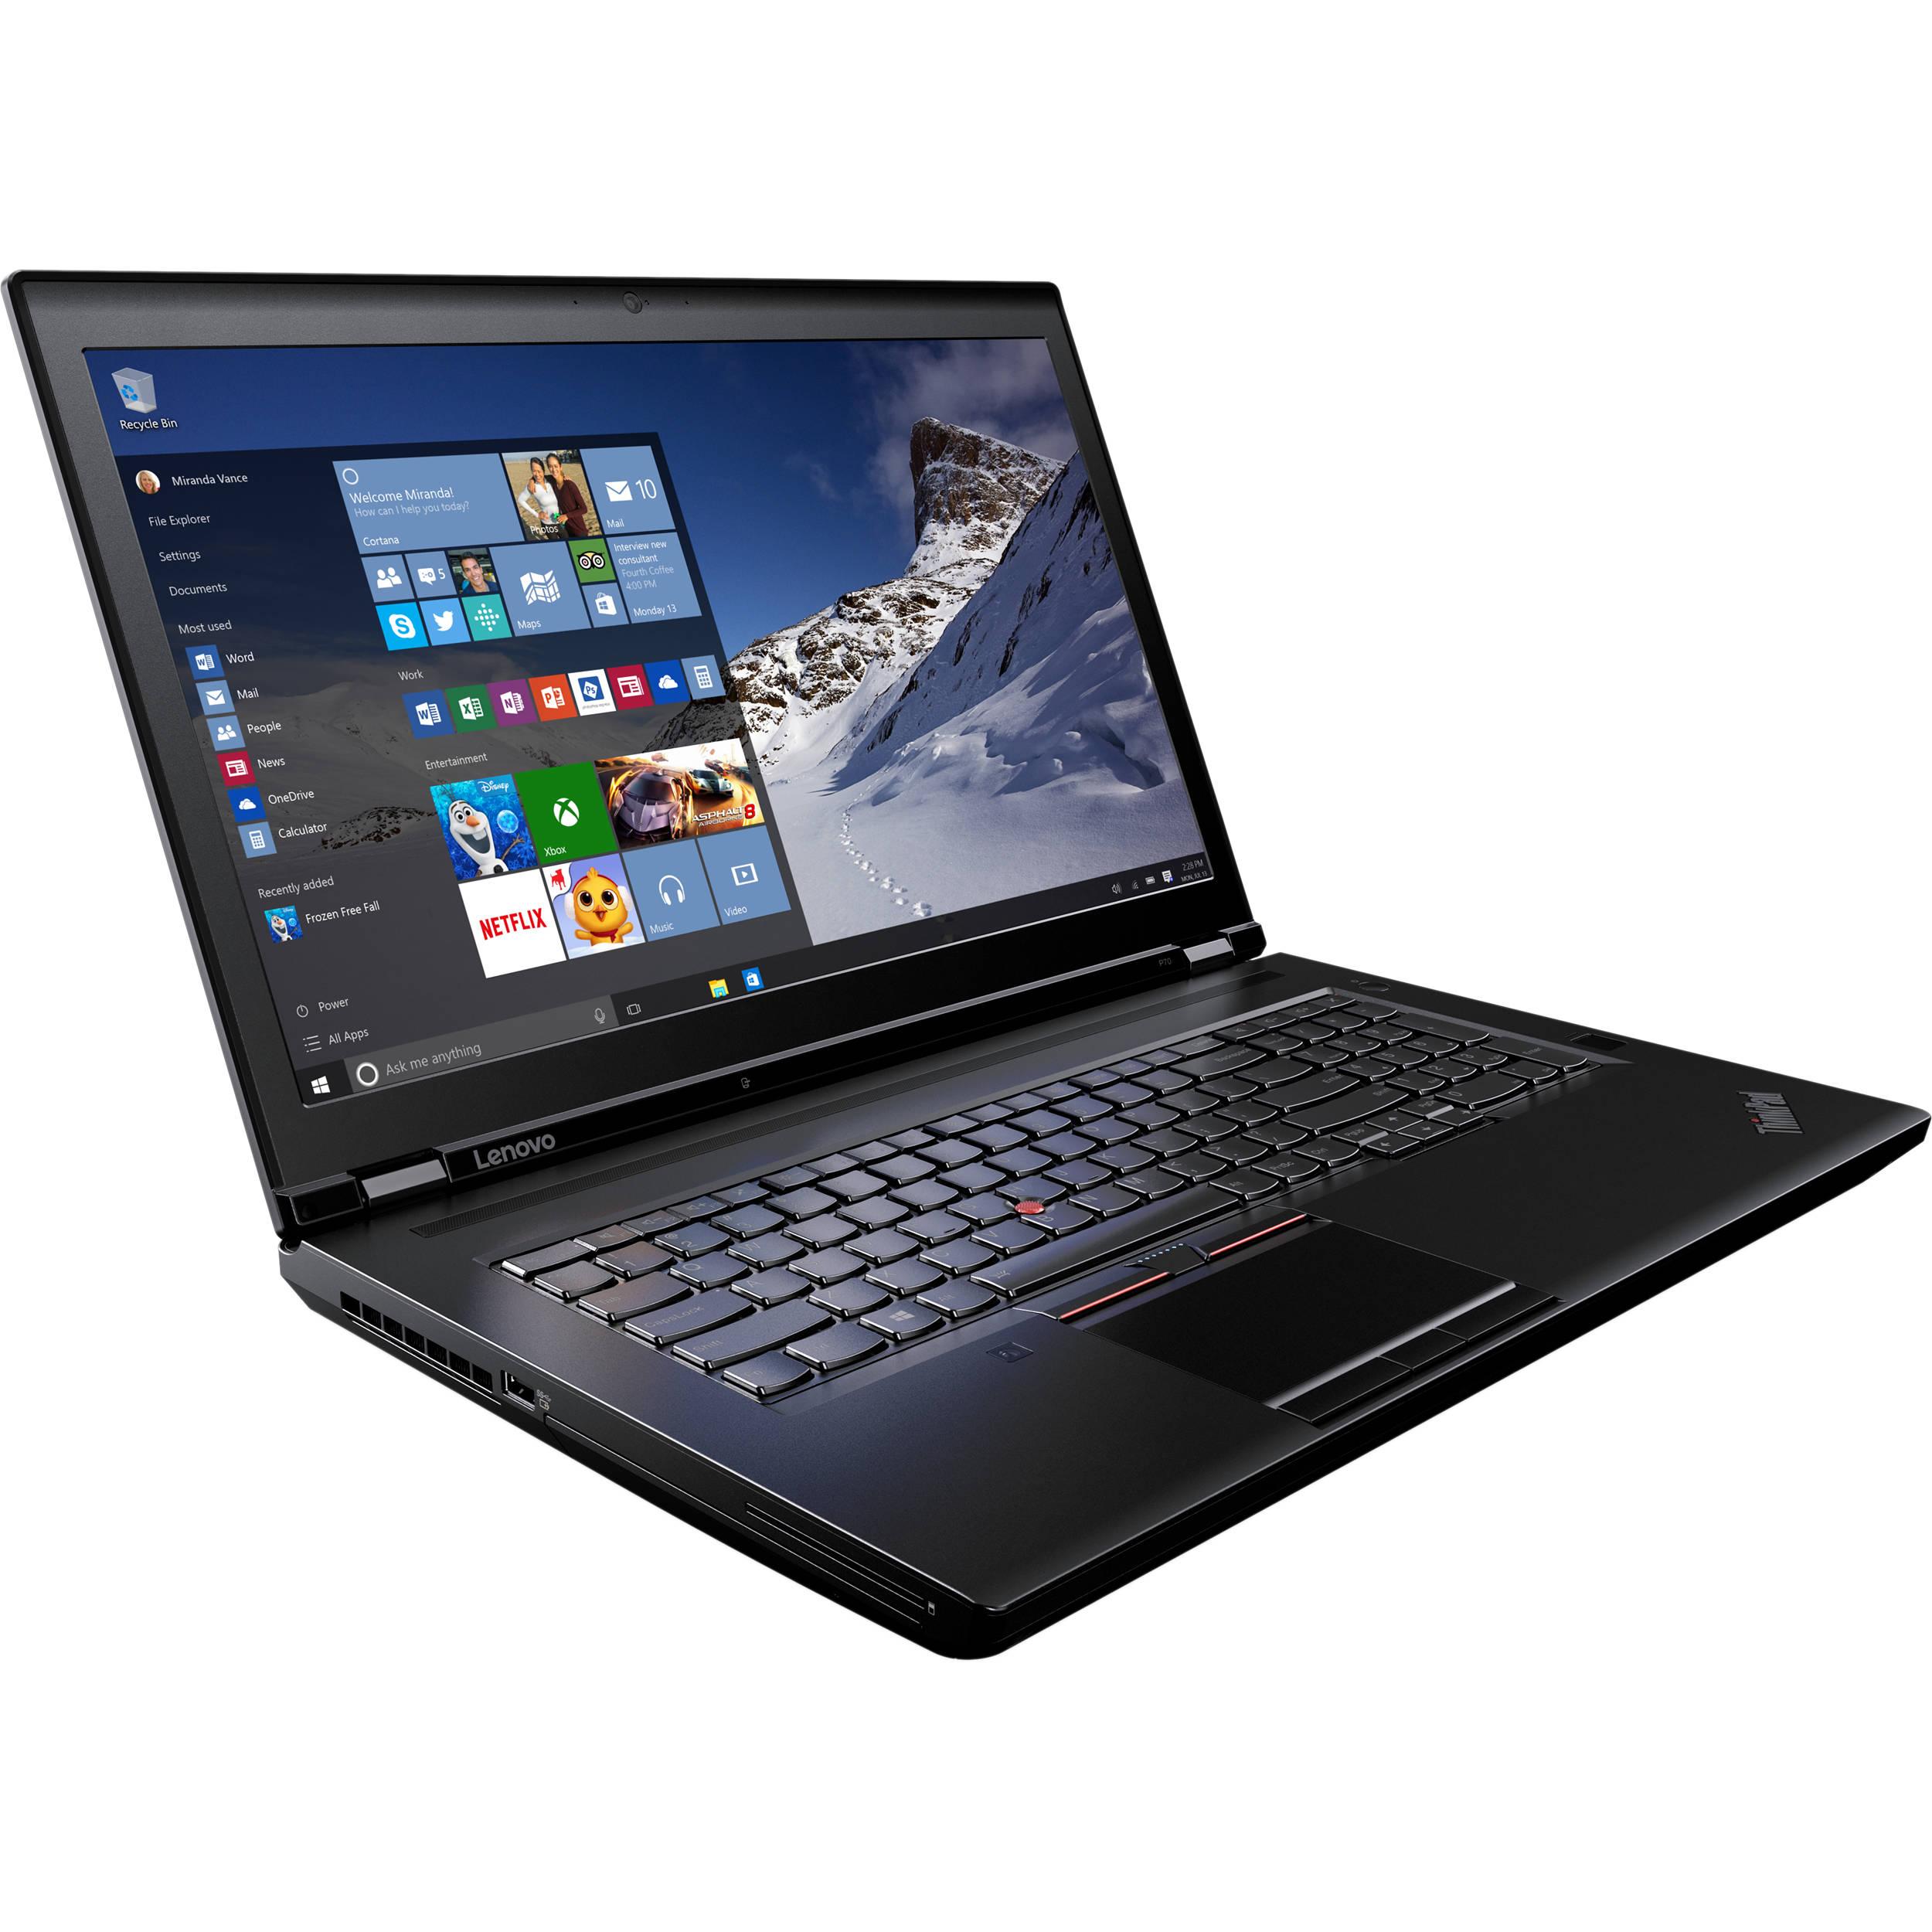 Lenovo thinkpad core i7 এর চিত্র ফলাফল